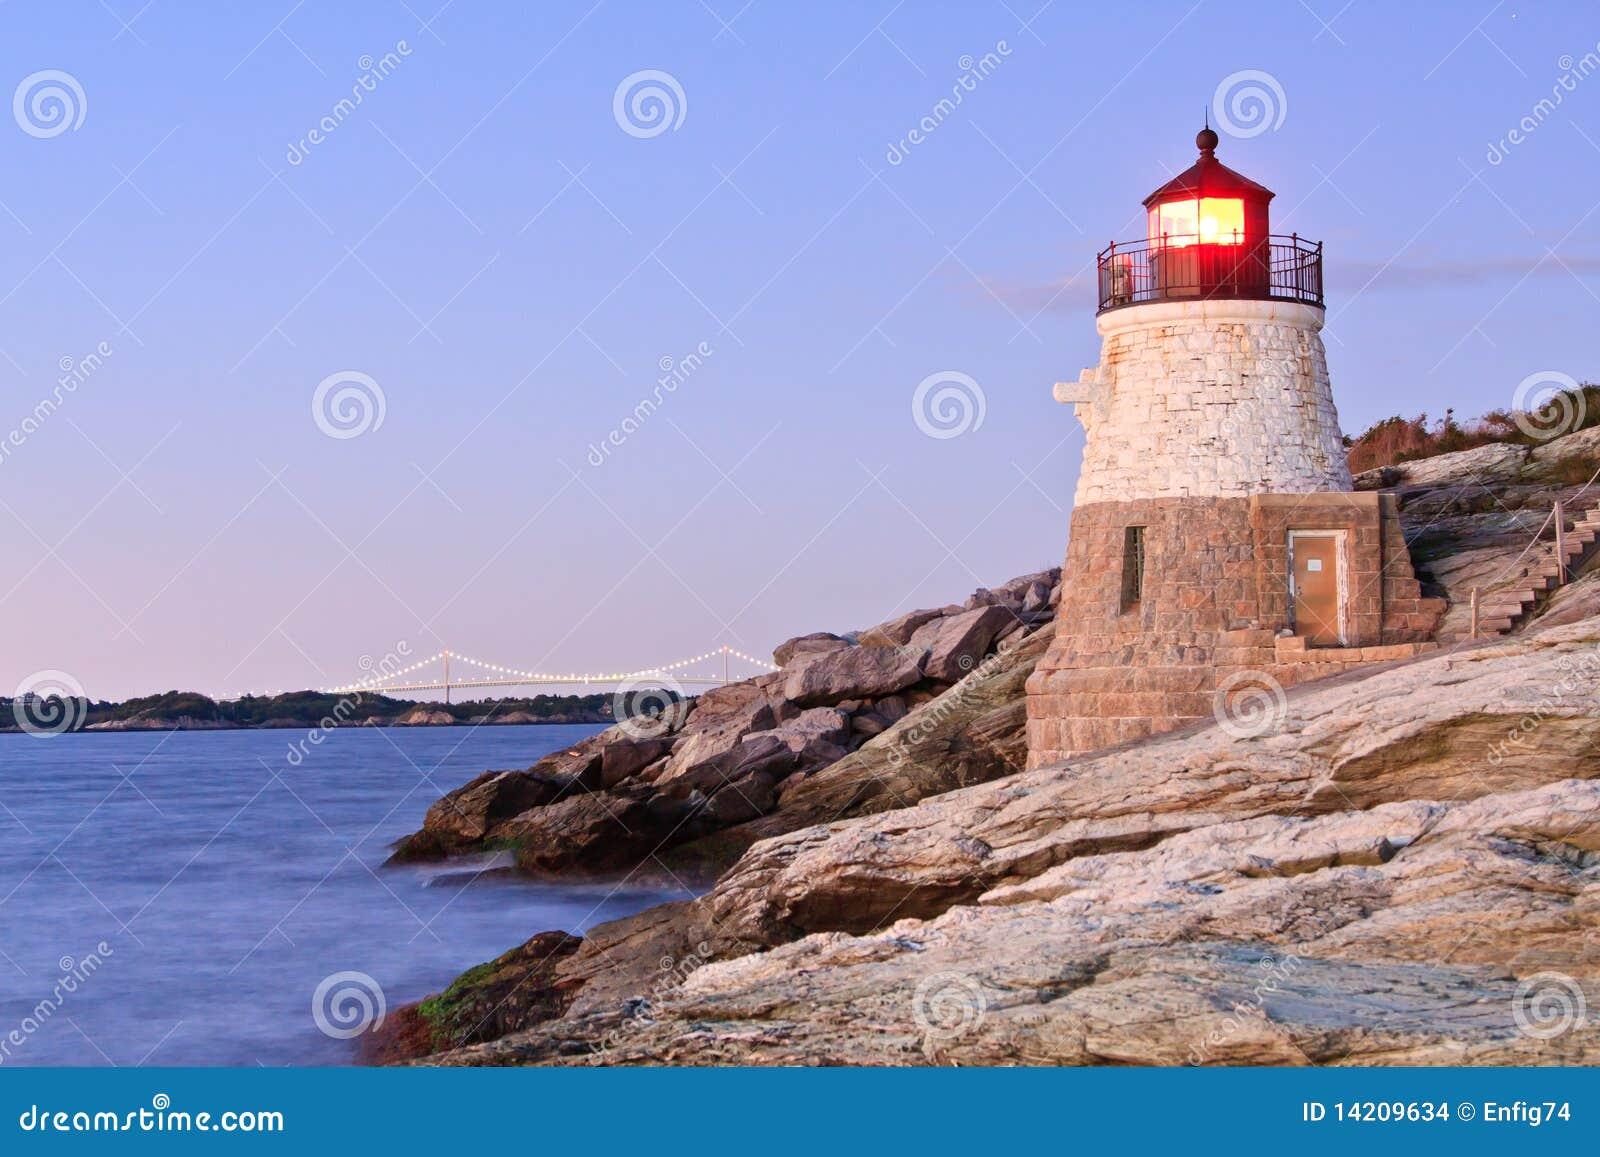 Castle Hill Lighthouse and Newport Bridge